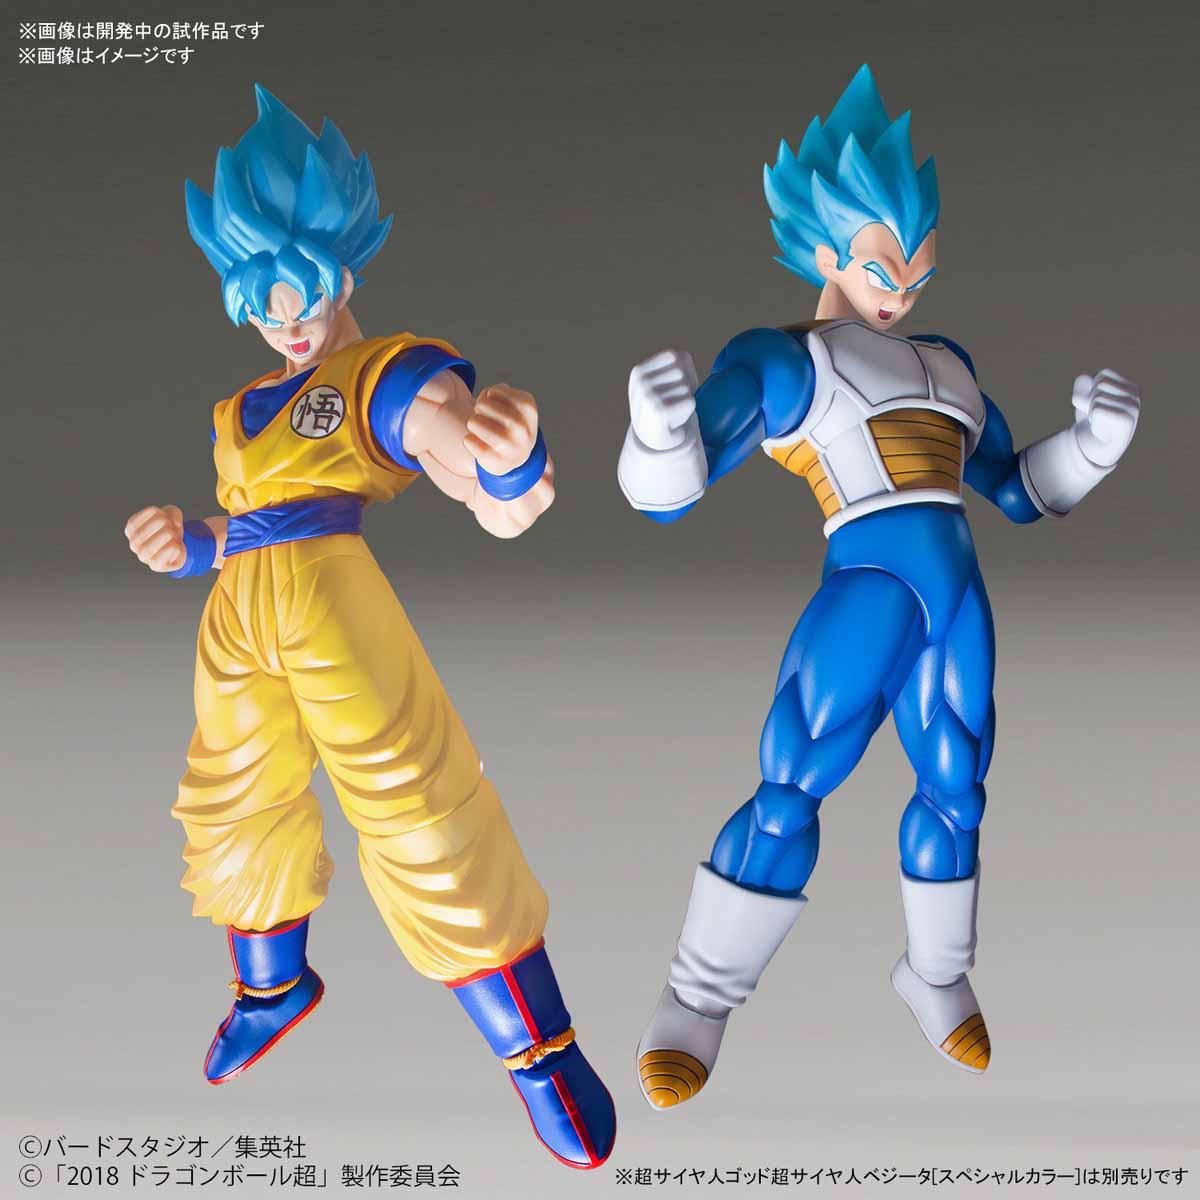 Bandai:Son Goku SS God & Vegeta SS God Figure-Rise Standard